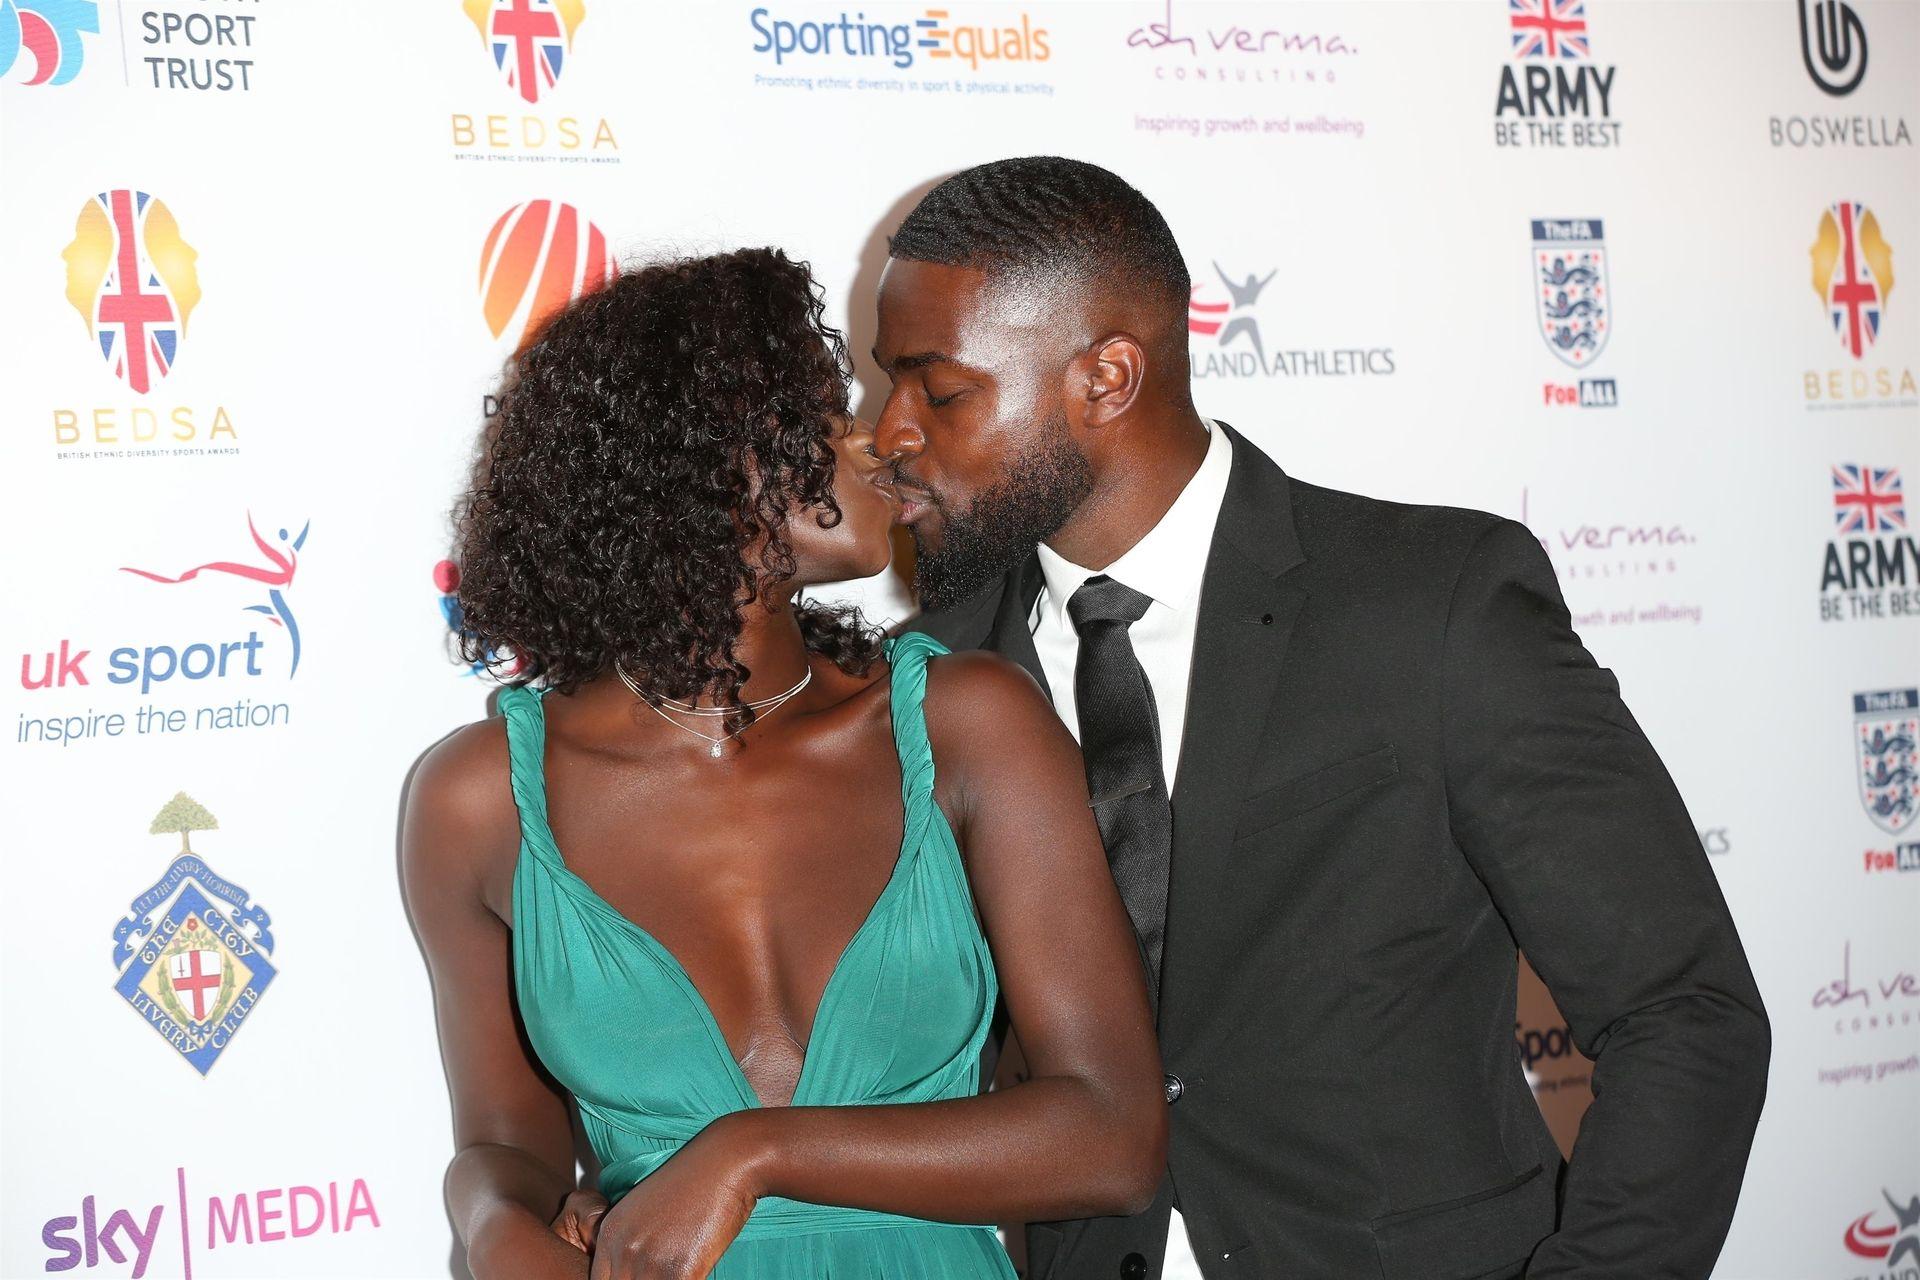 Mike Boateng & Priscilla Anyabu Are Seen At British Ethnic Diversity Sports Awards 0063